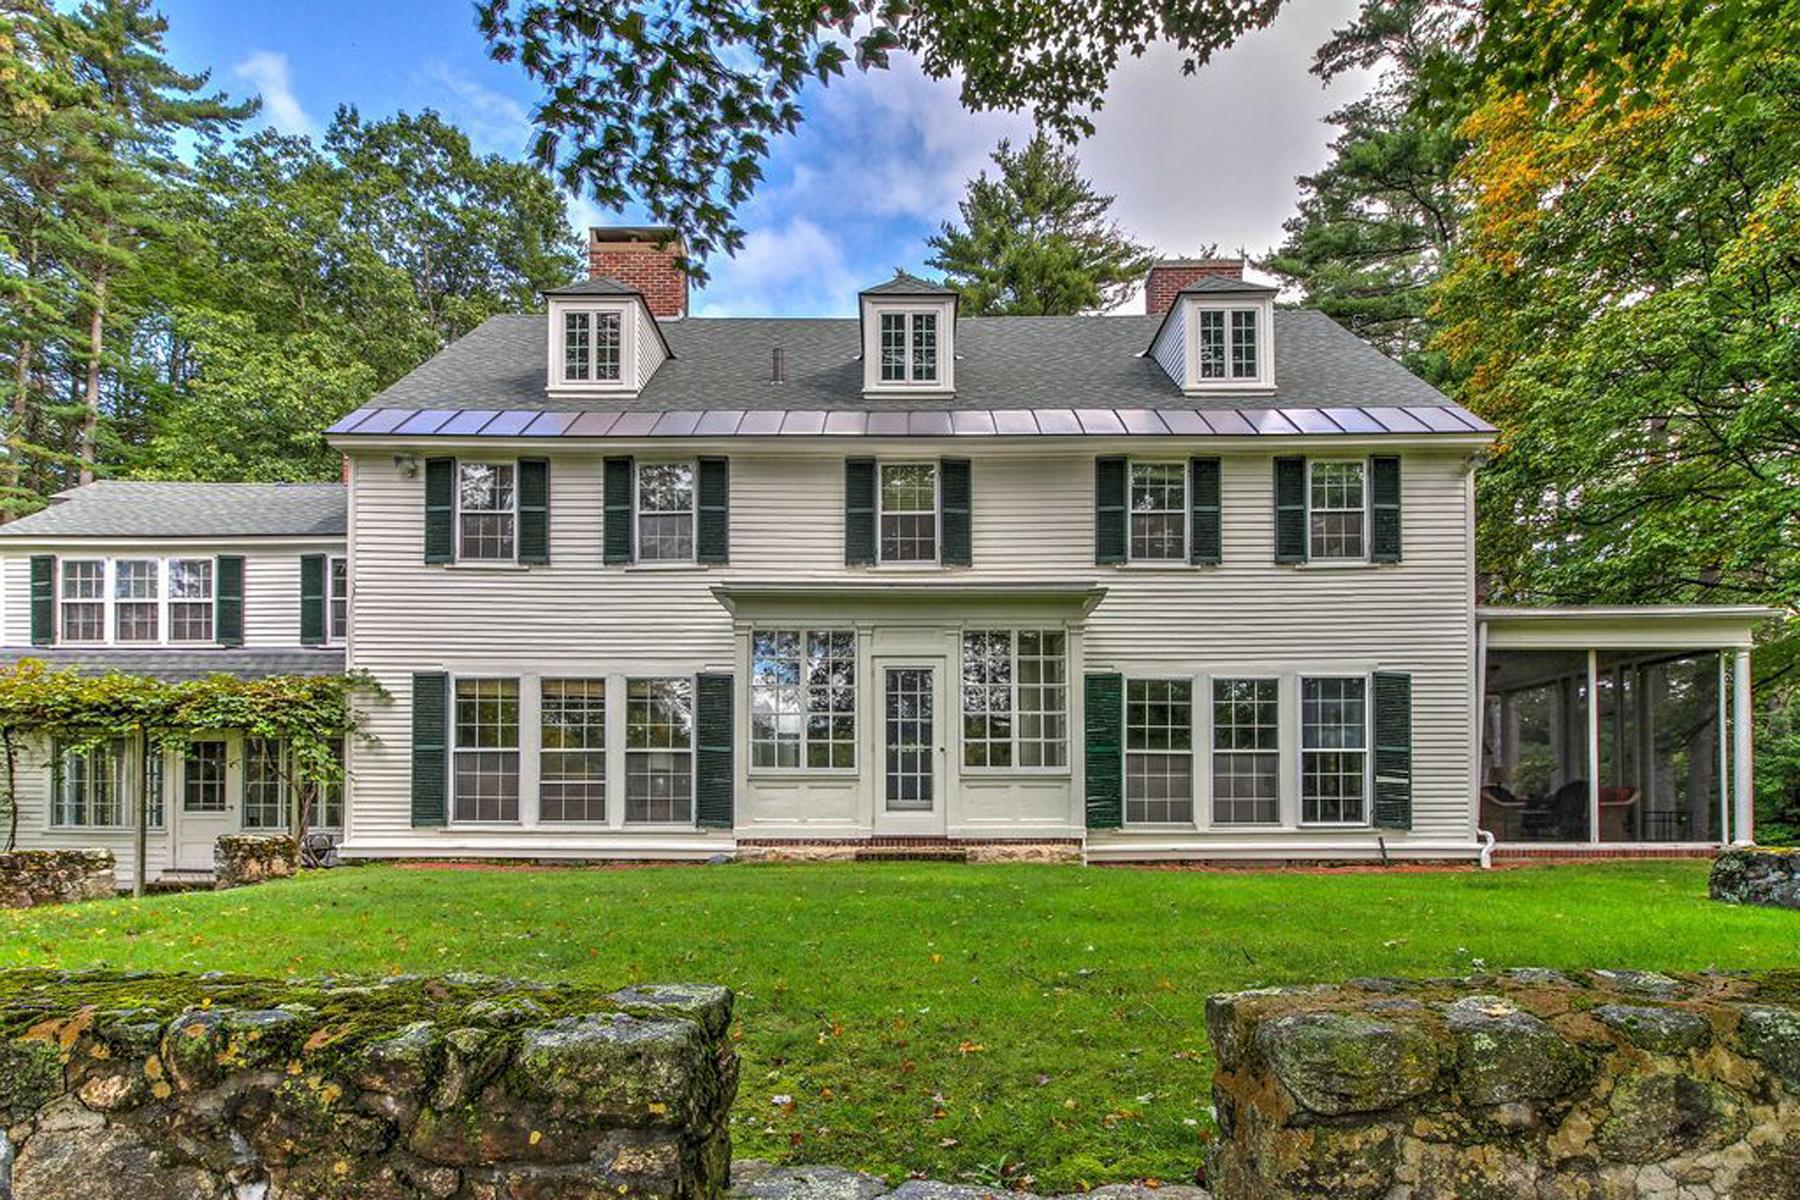 Single Family Home for Sale at 4 Felt Road, Keene 4 Felt Rd Keene, New Hampshire 03431 United States